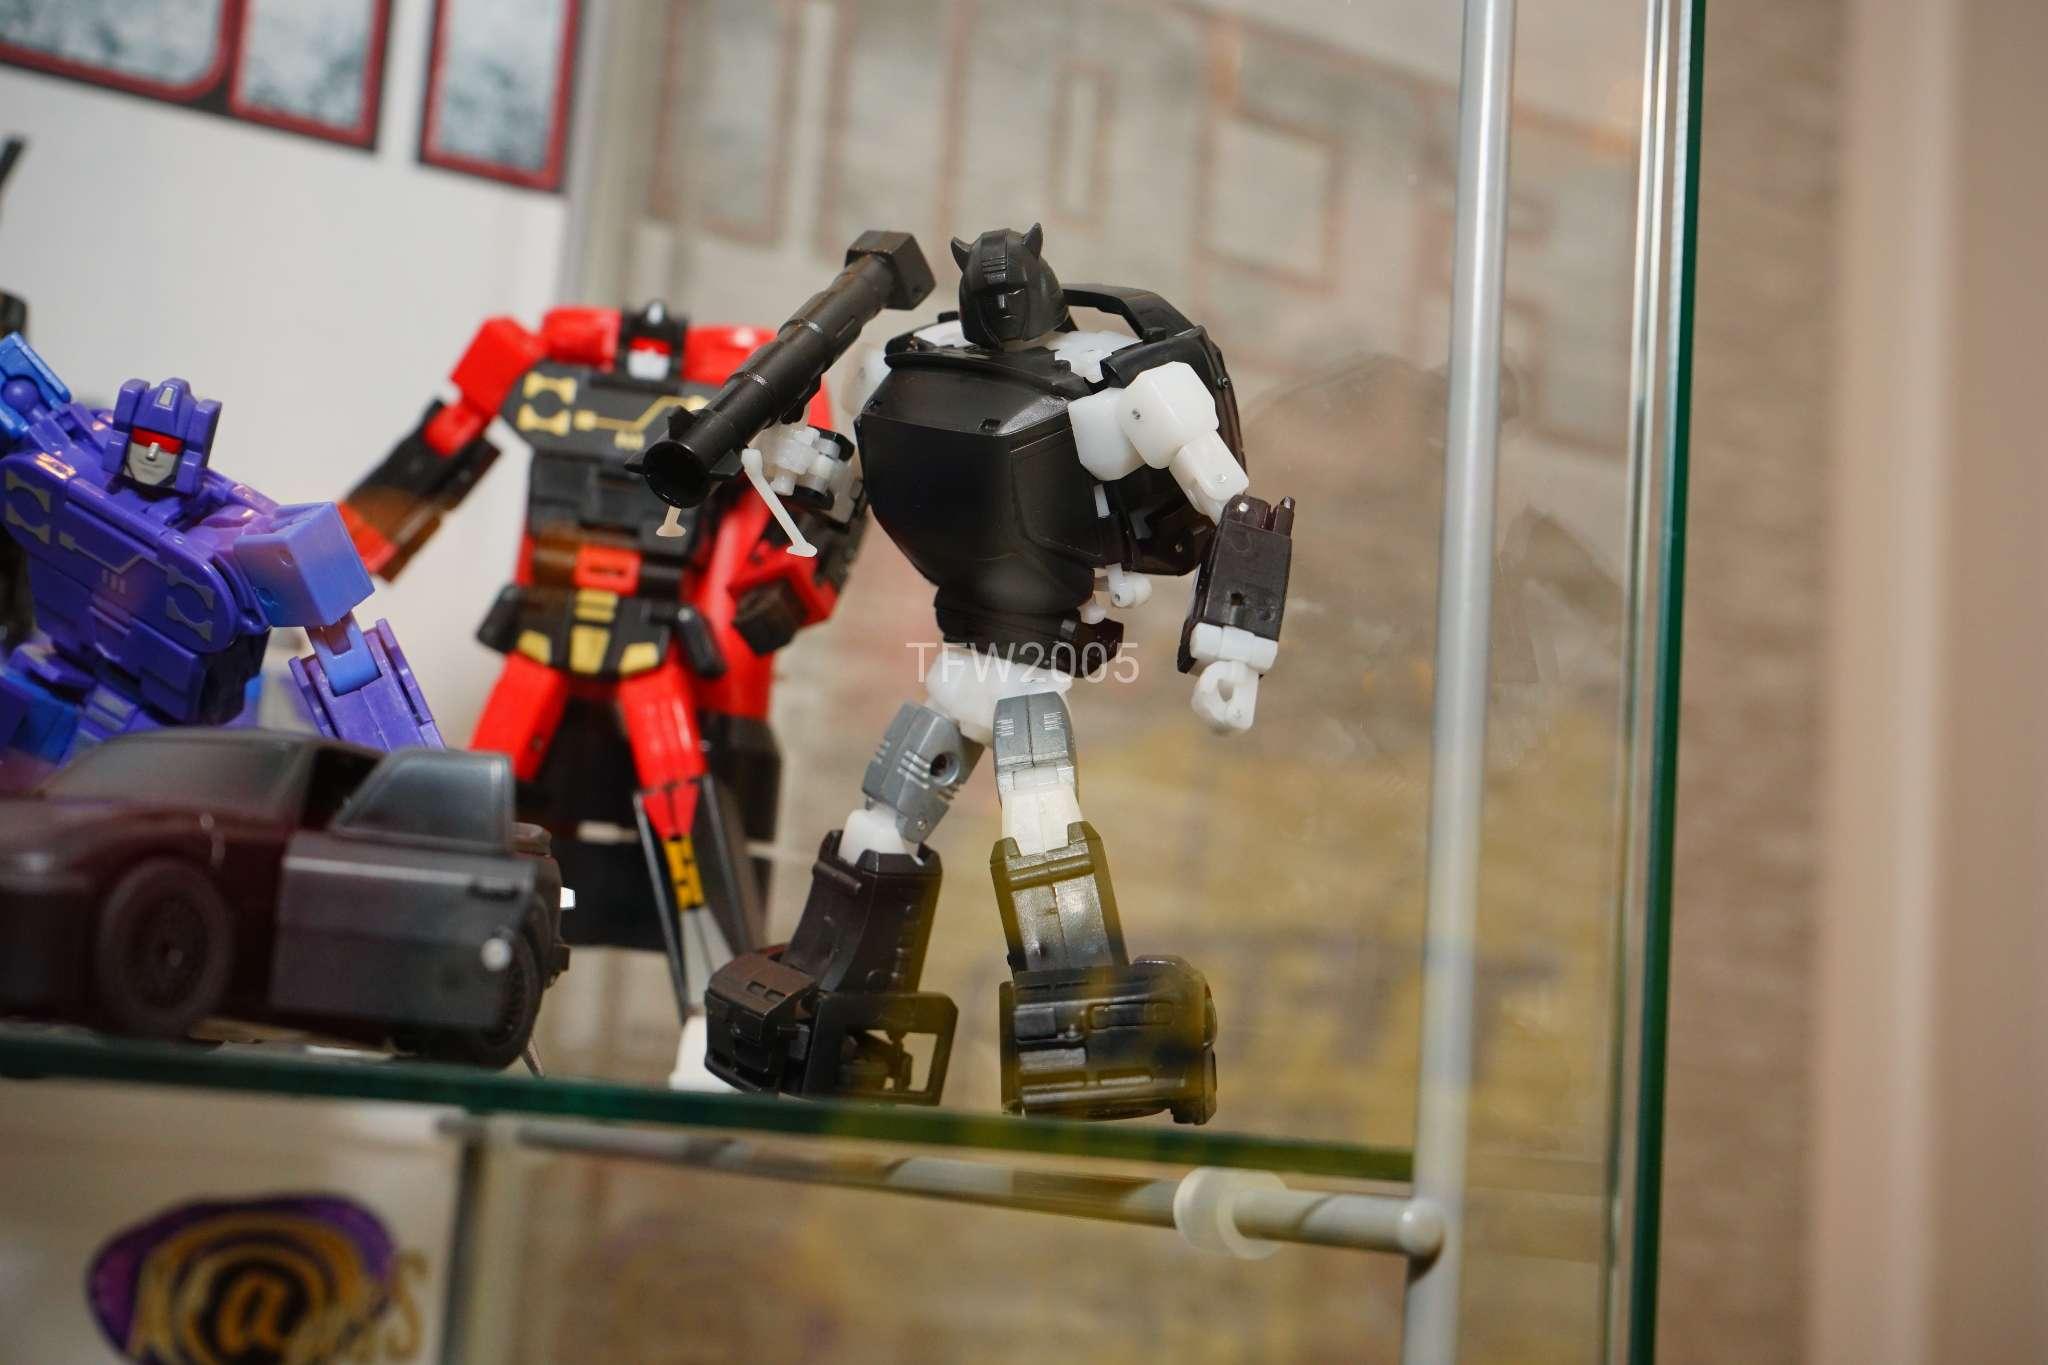 [Ocular Max] Produit Tiers - Minibots MP - PS-09 Hellion (aka Cliffjumper/Matamore), PS-11 Omne - (aka Cosmos) IFqFilOA_o